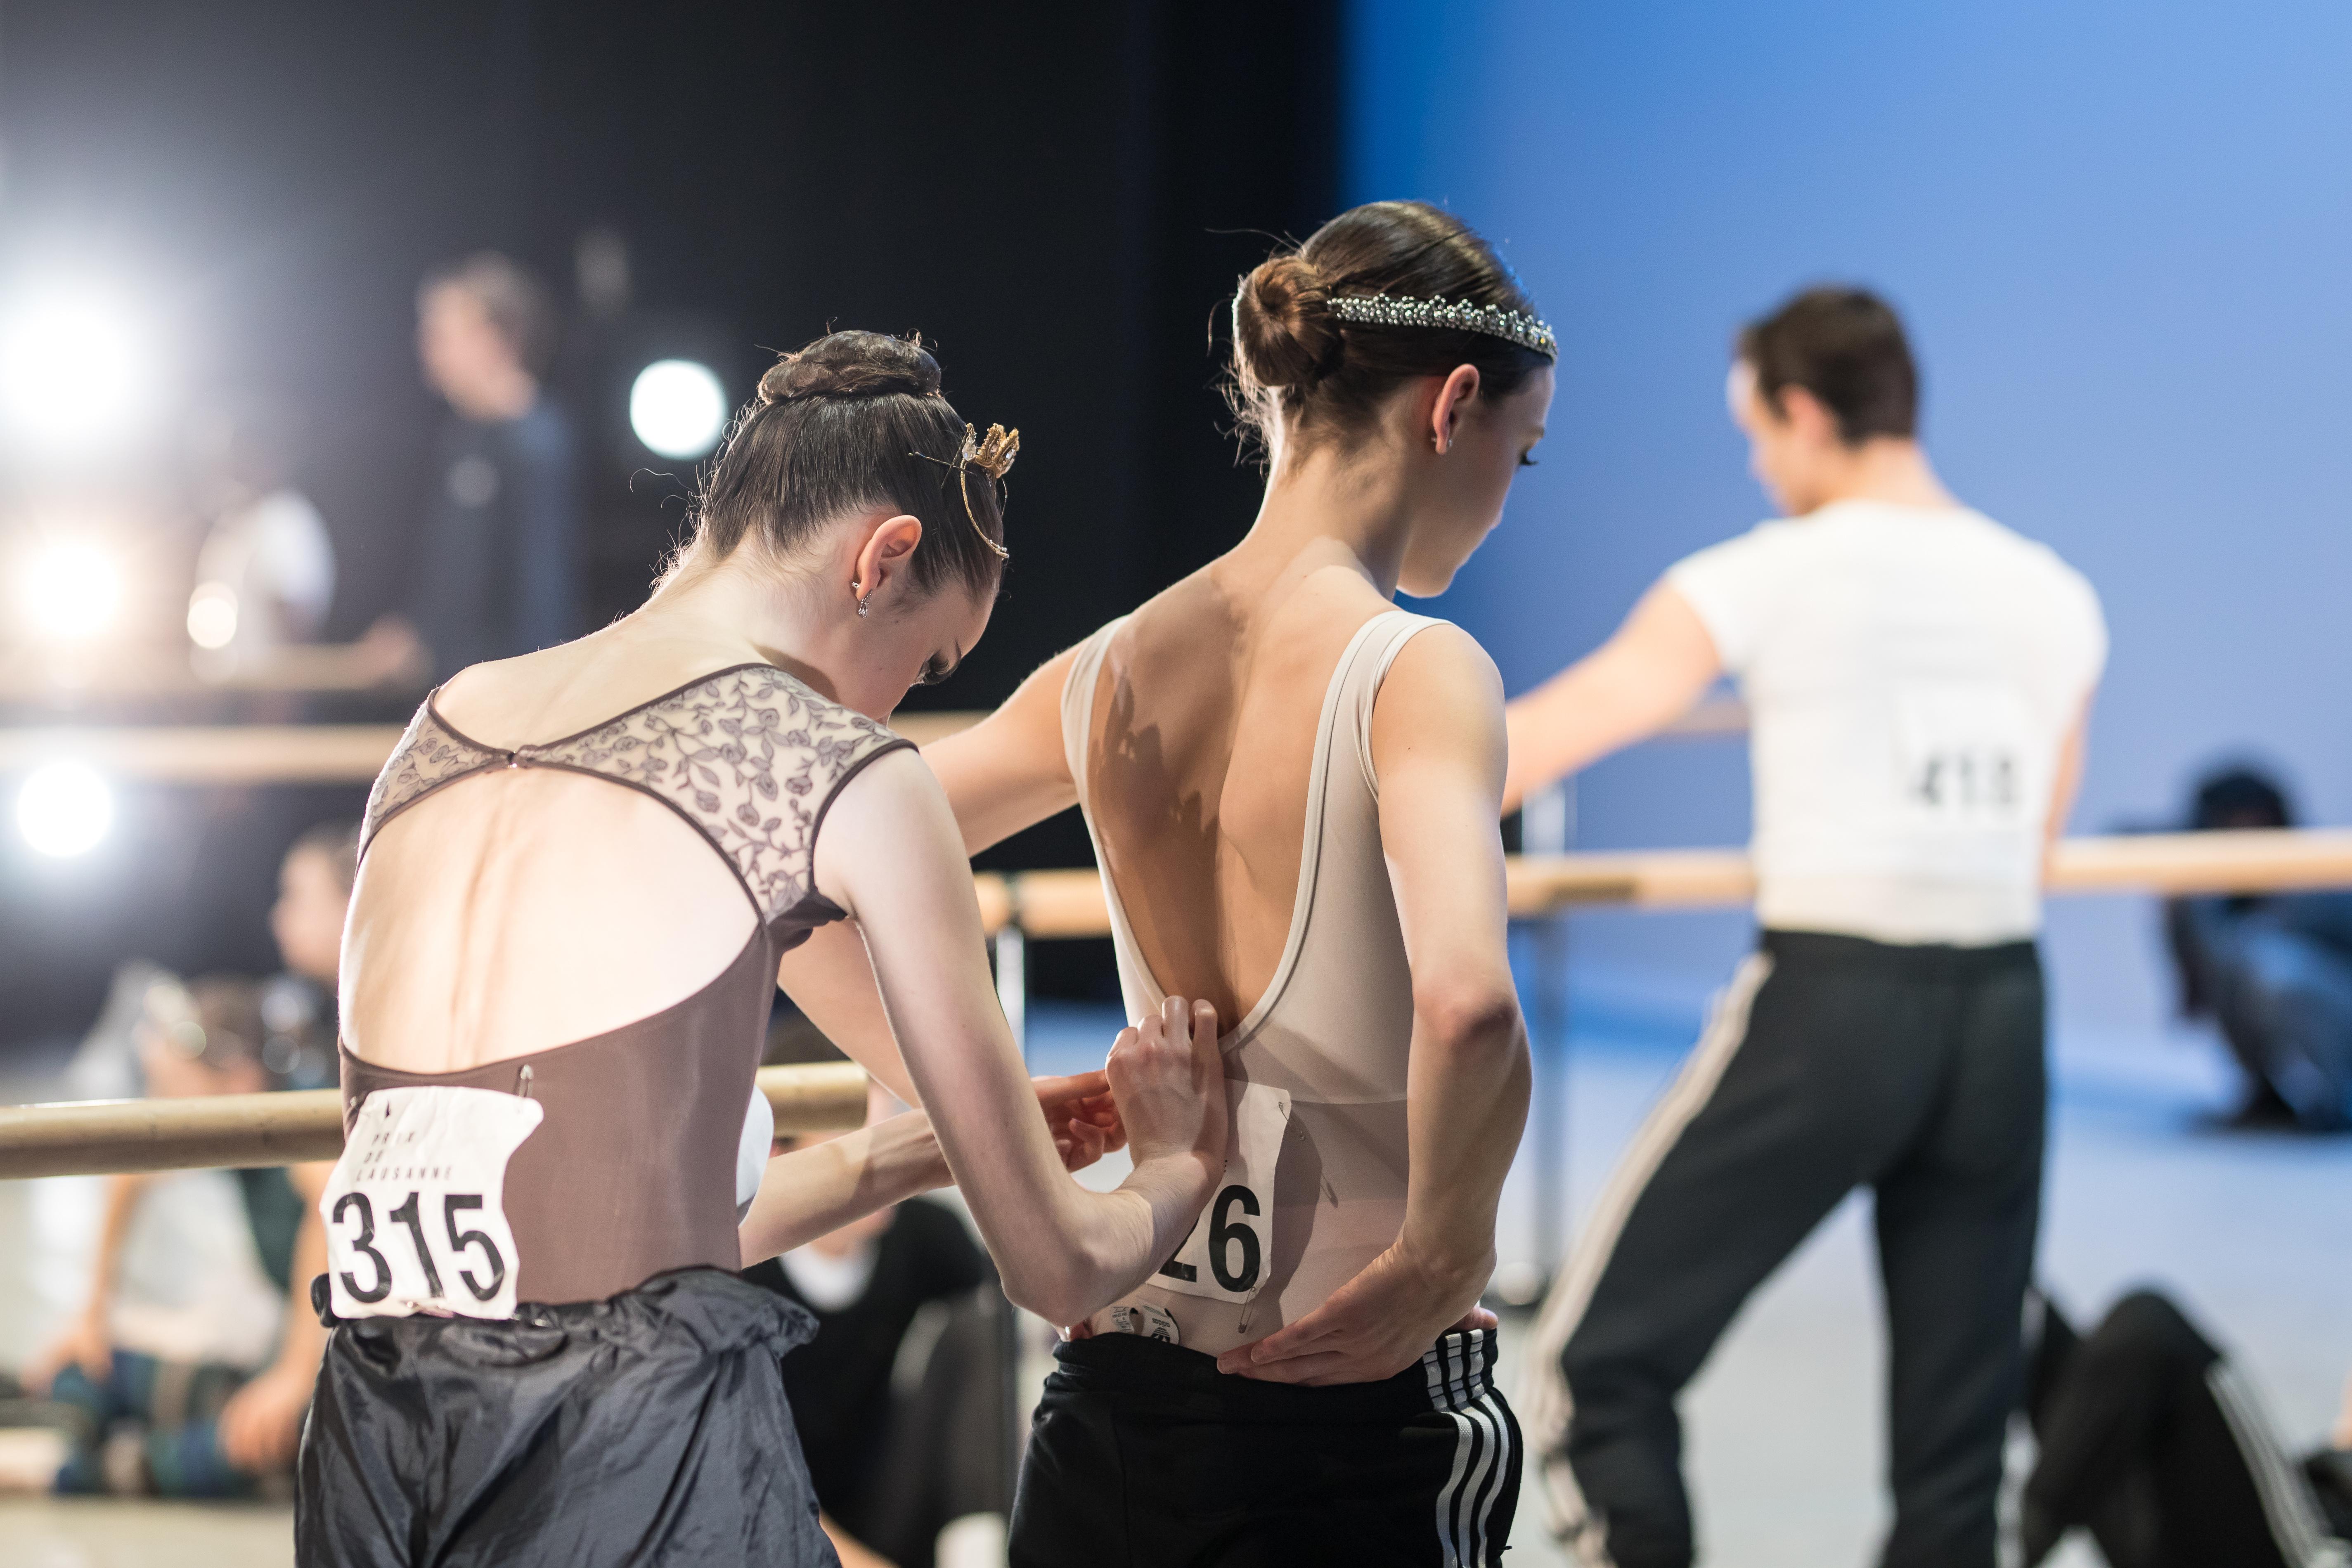 Calling All Dancers Ages 15-18: Registration for the 2020 Prix de Lausanne is Now Open